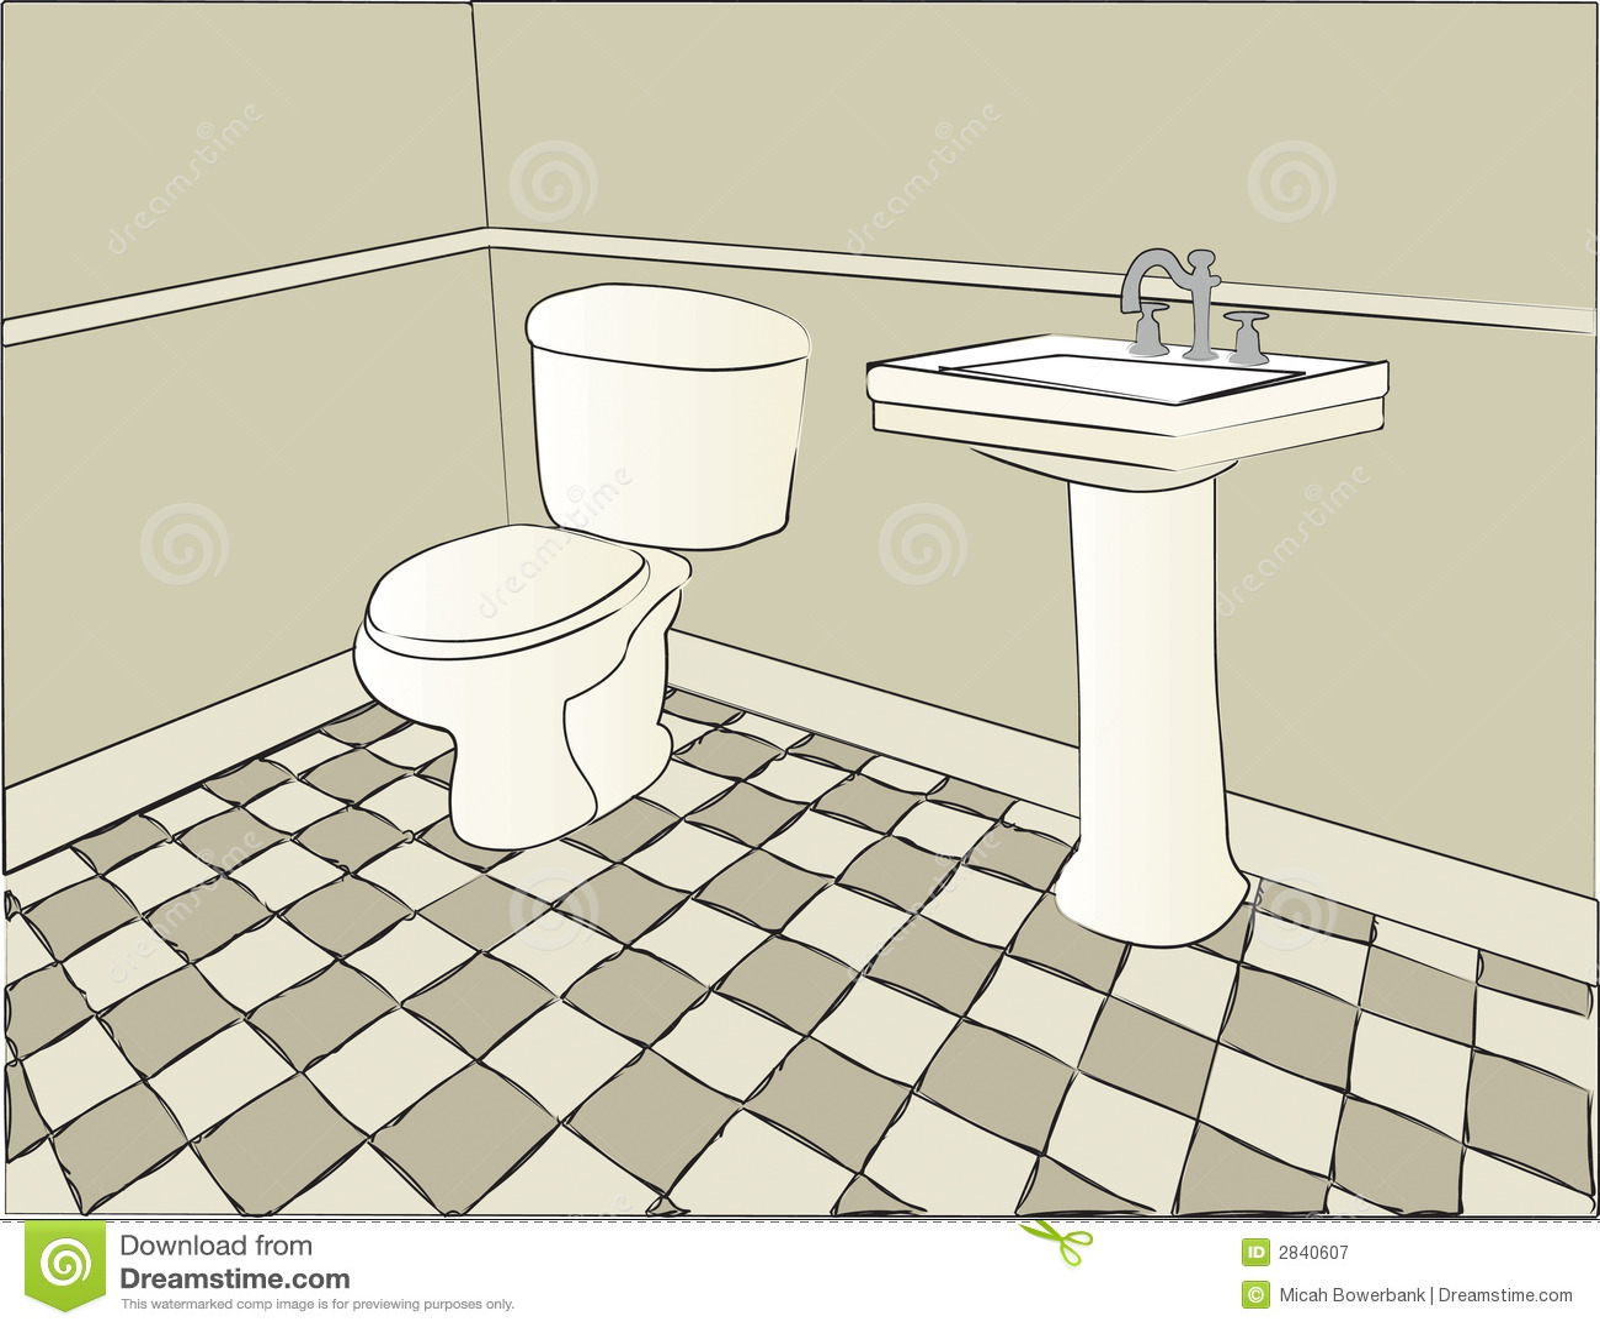 Bathroom and toilet scene stock image for Bathroom scenes photos